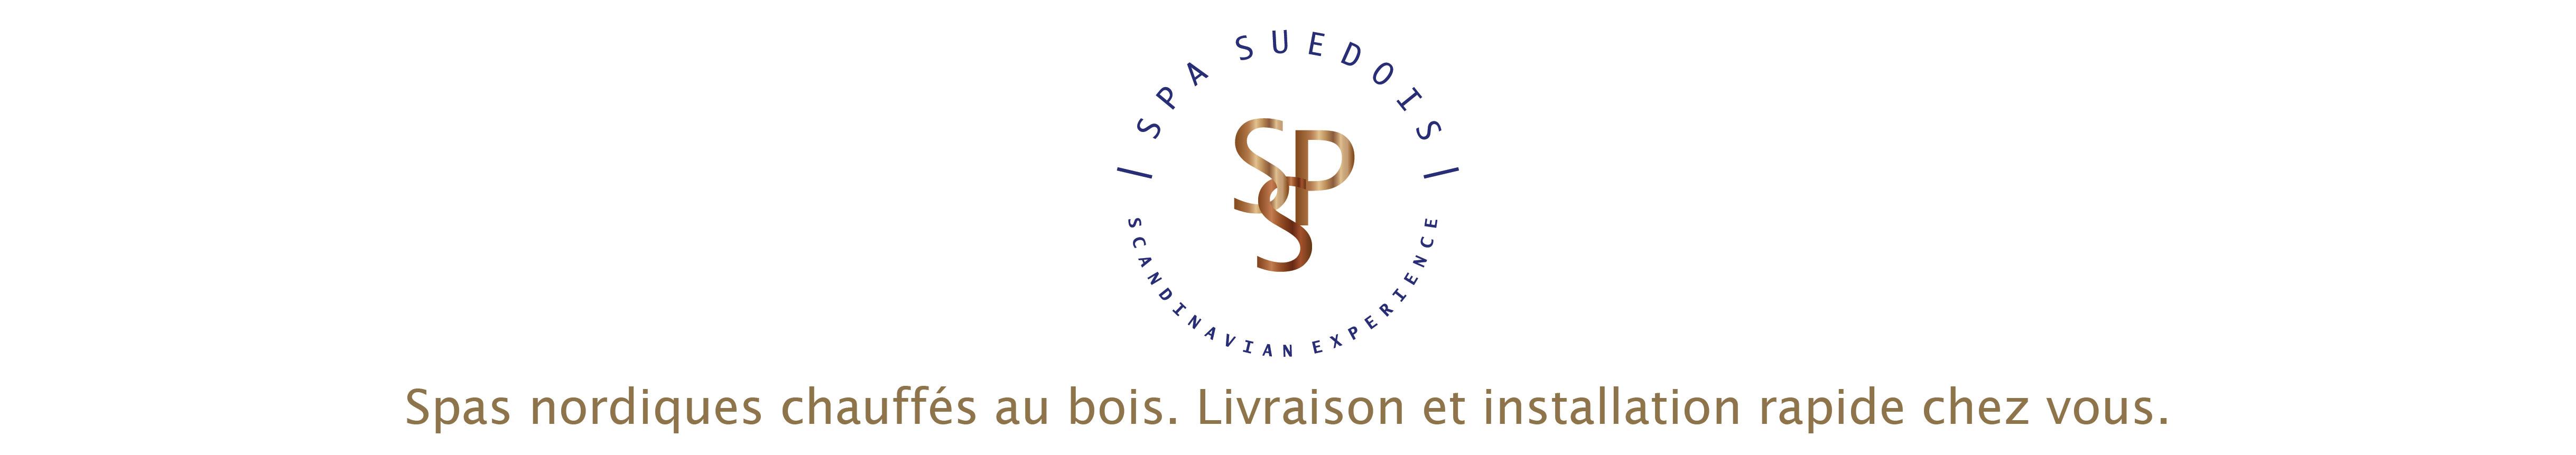 Spa Suédois